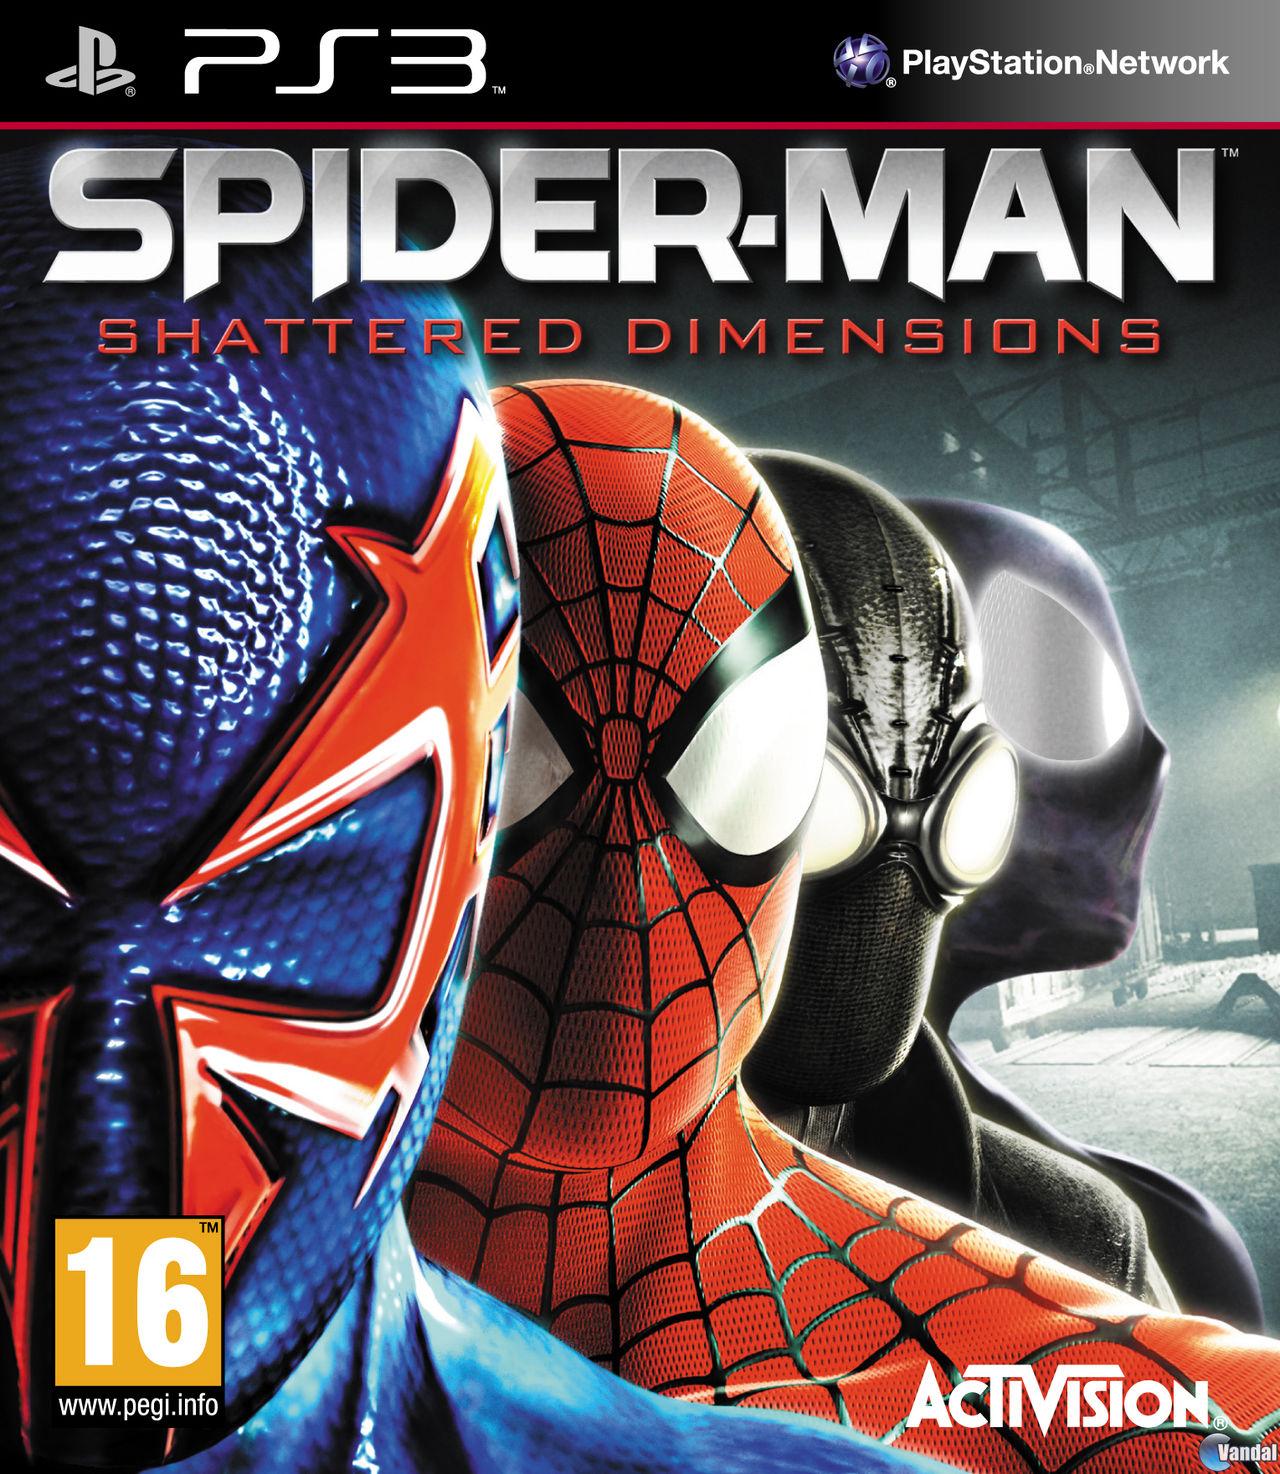 SpiderMan Shattered Dimensions TODA la informacin  PS3  Vandal